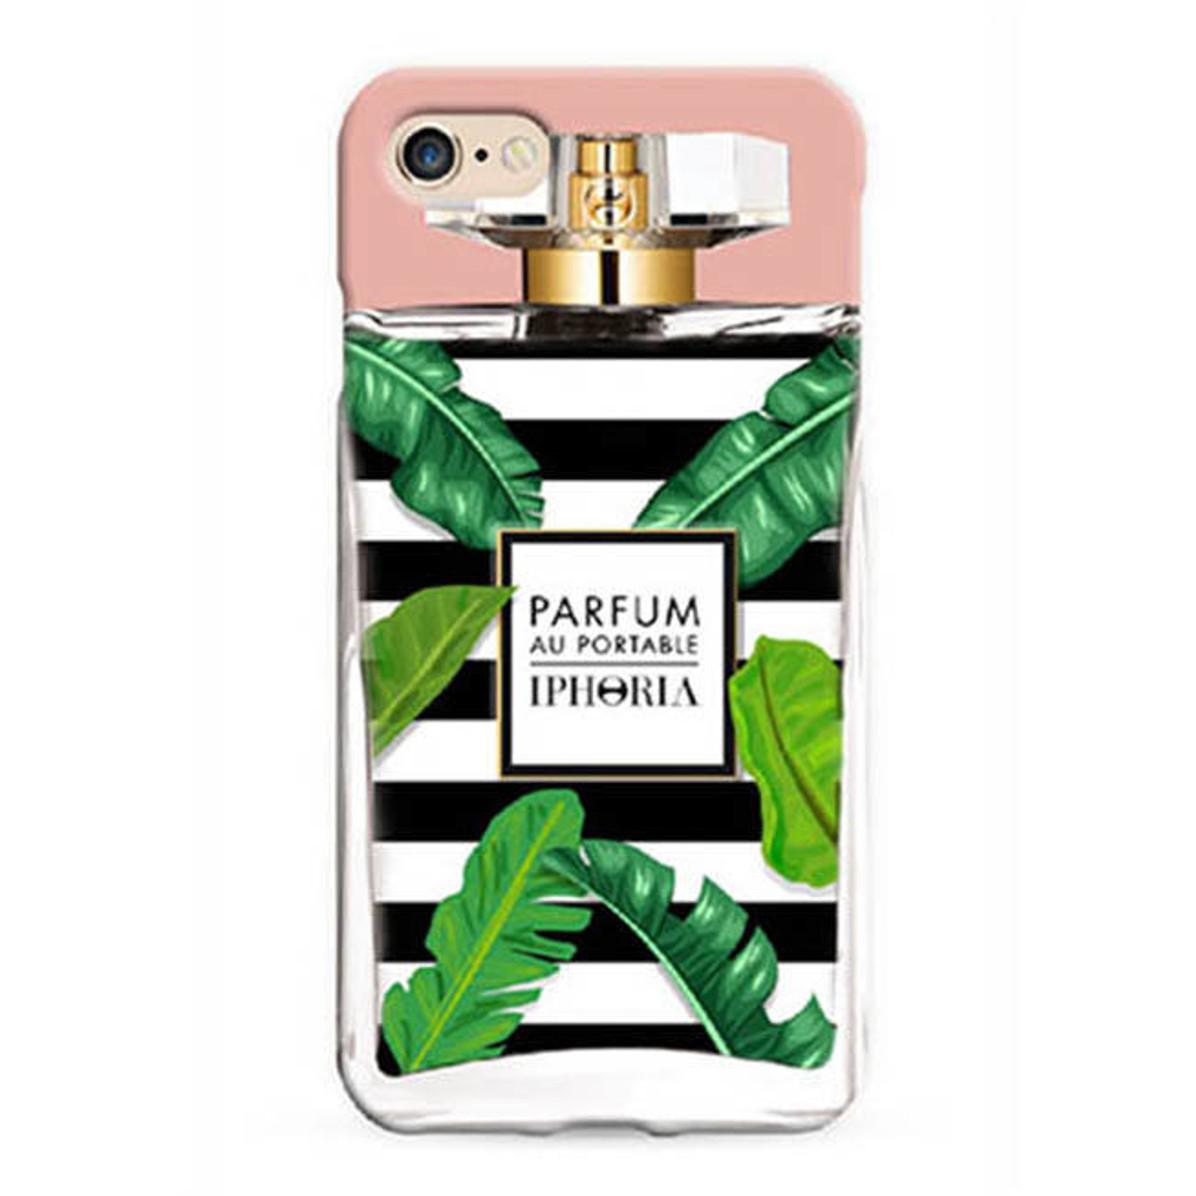 IPHORIA アイフォリア Perfume Case Black and White Flacon for iPhone 7/8 パフュームケースブラックアンドホワイトフラコン